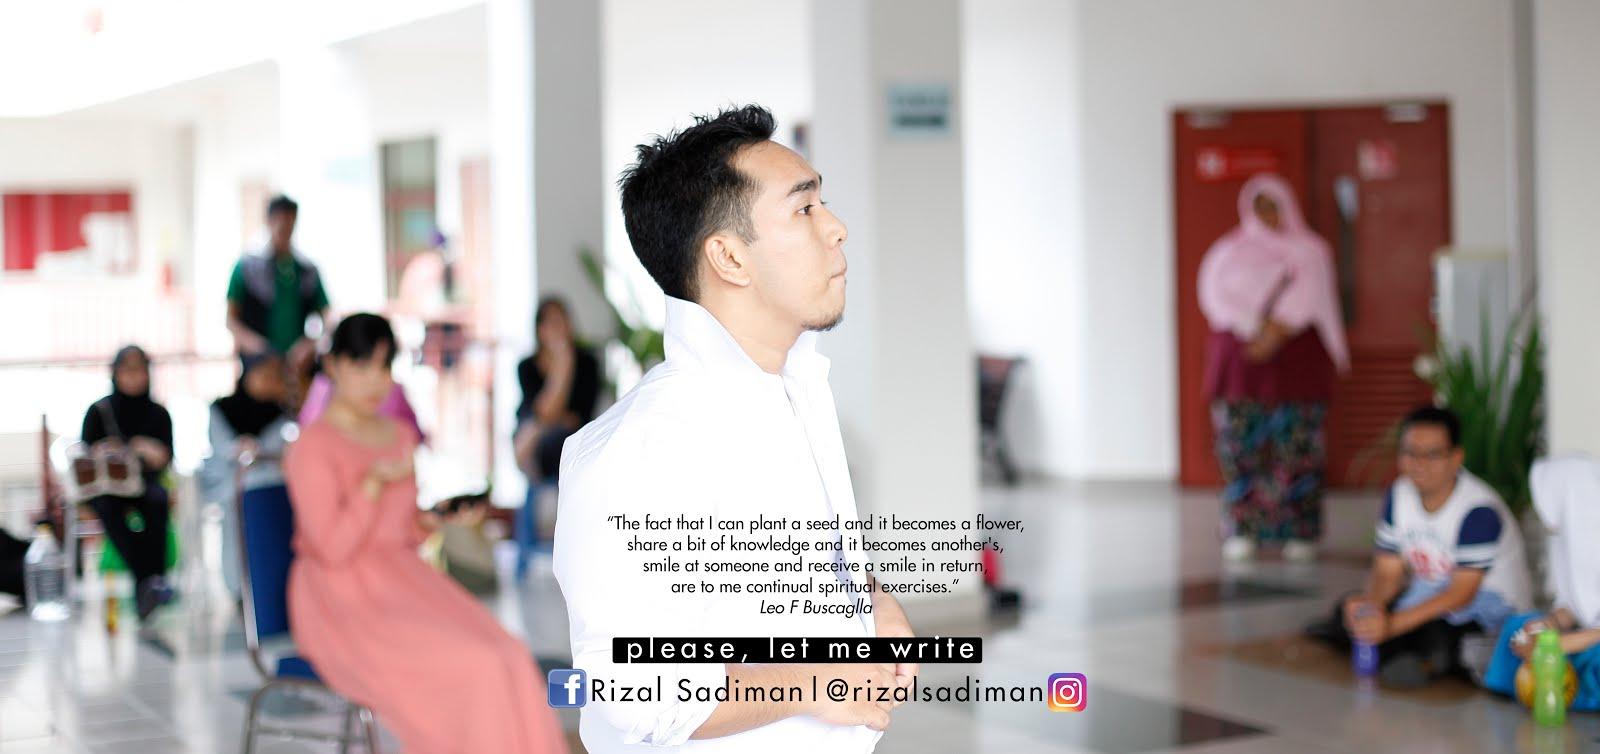 Rizal Sadiman